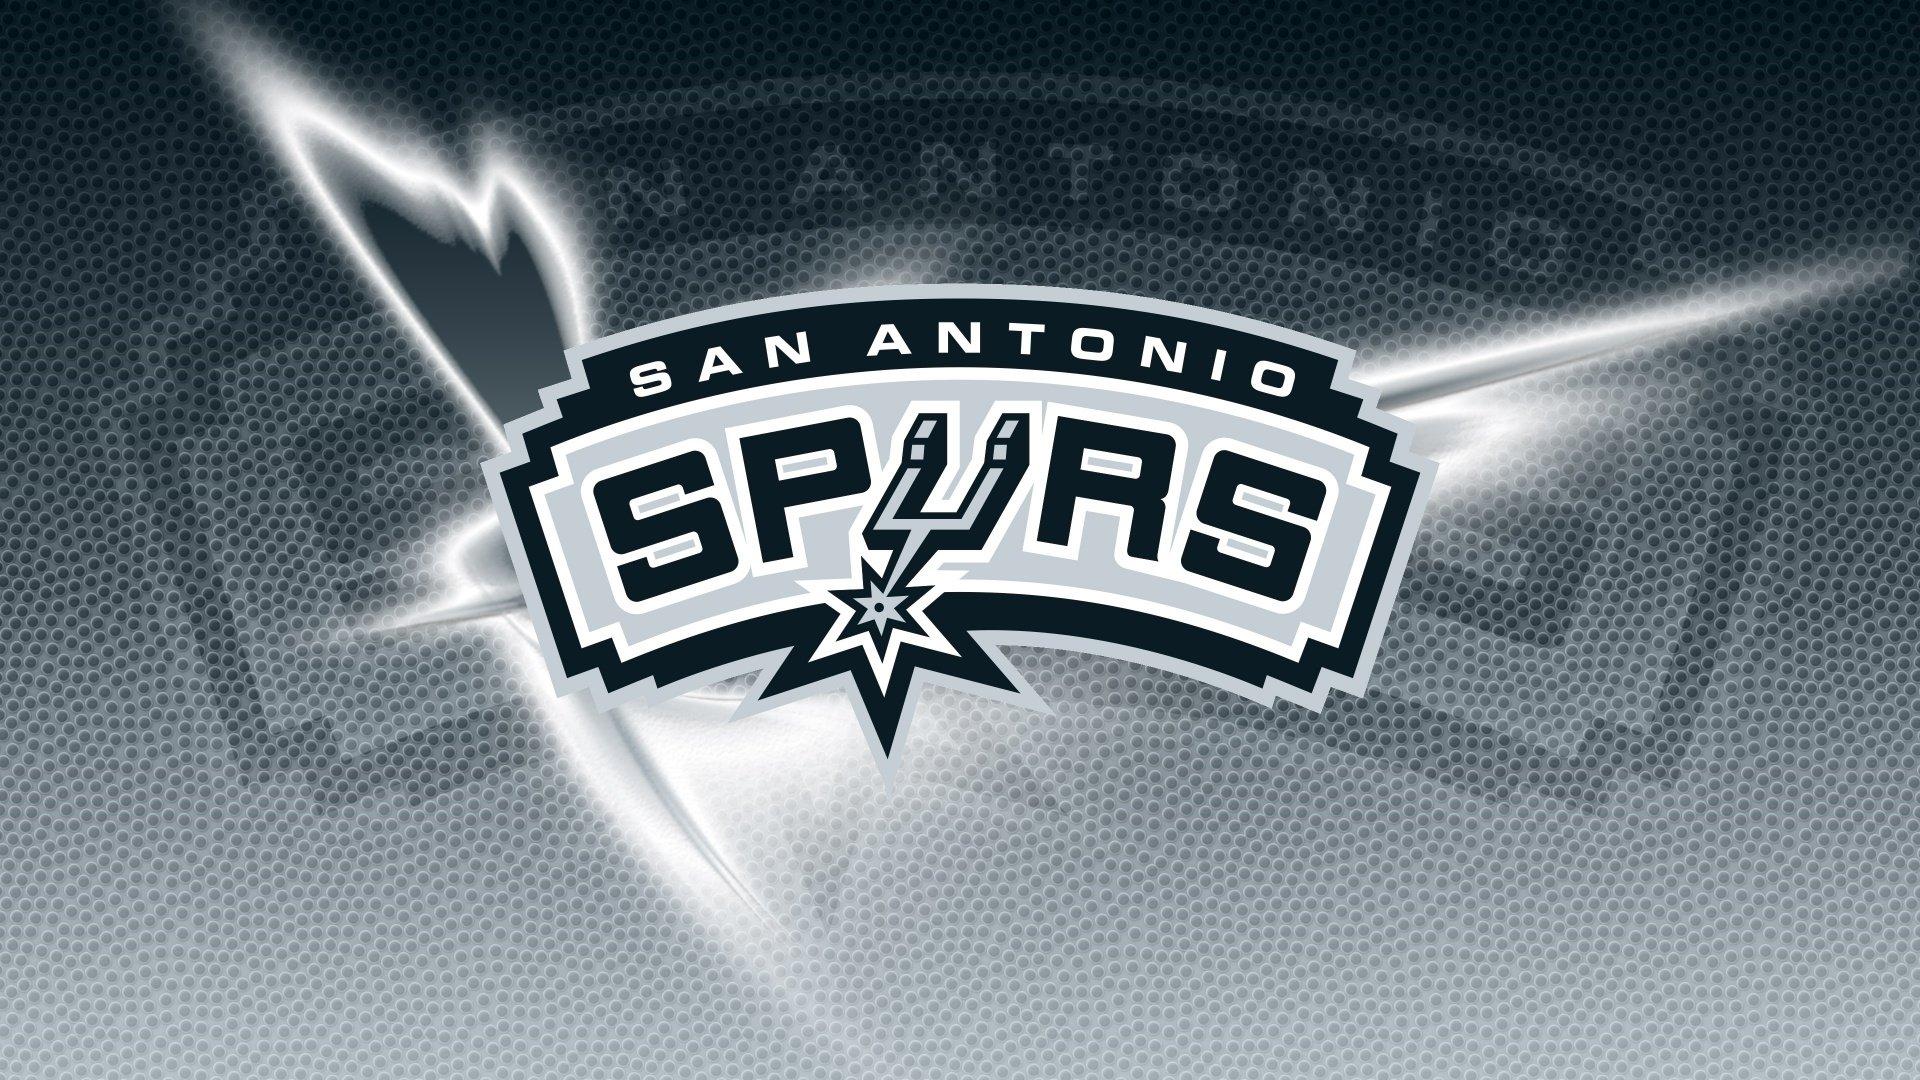 San Antonio Spurs computer wallpaper